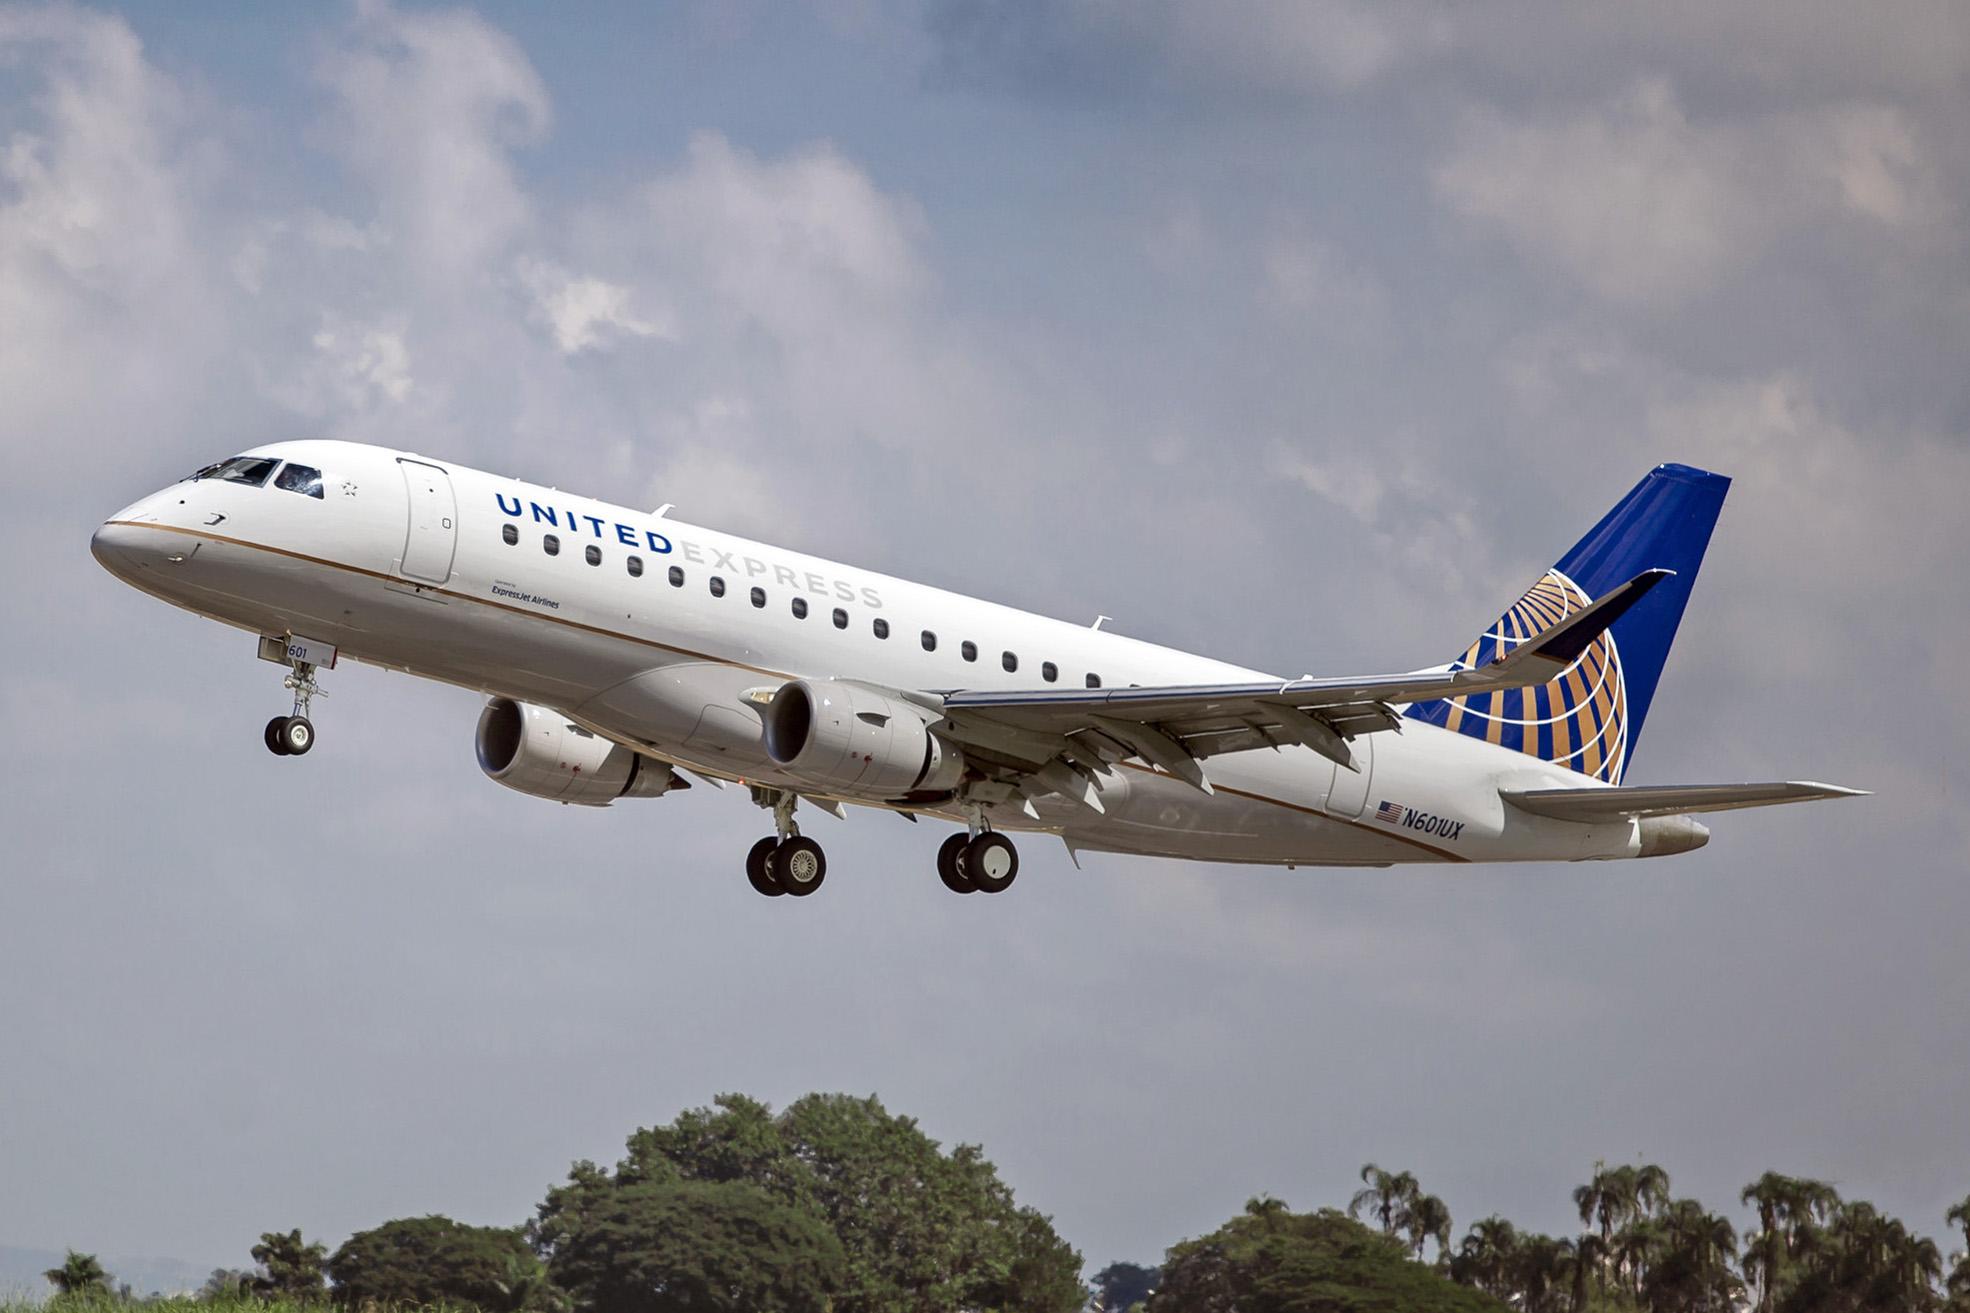 Expressjet Airlines A United Express Carrier Begins